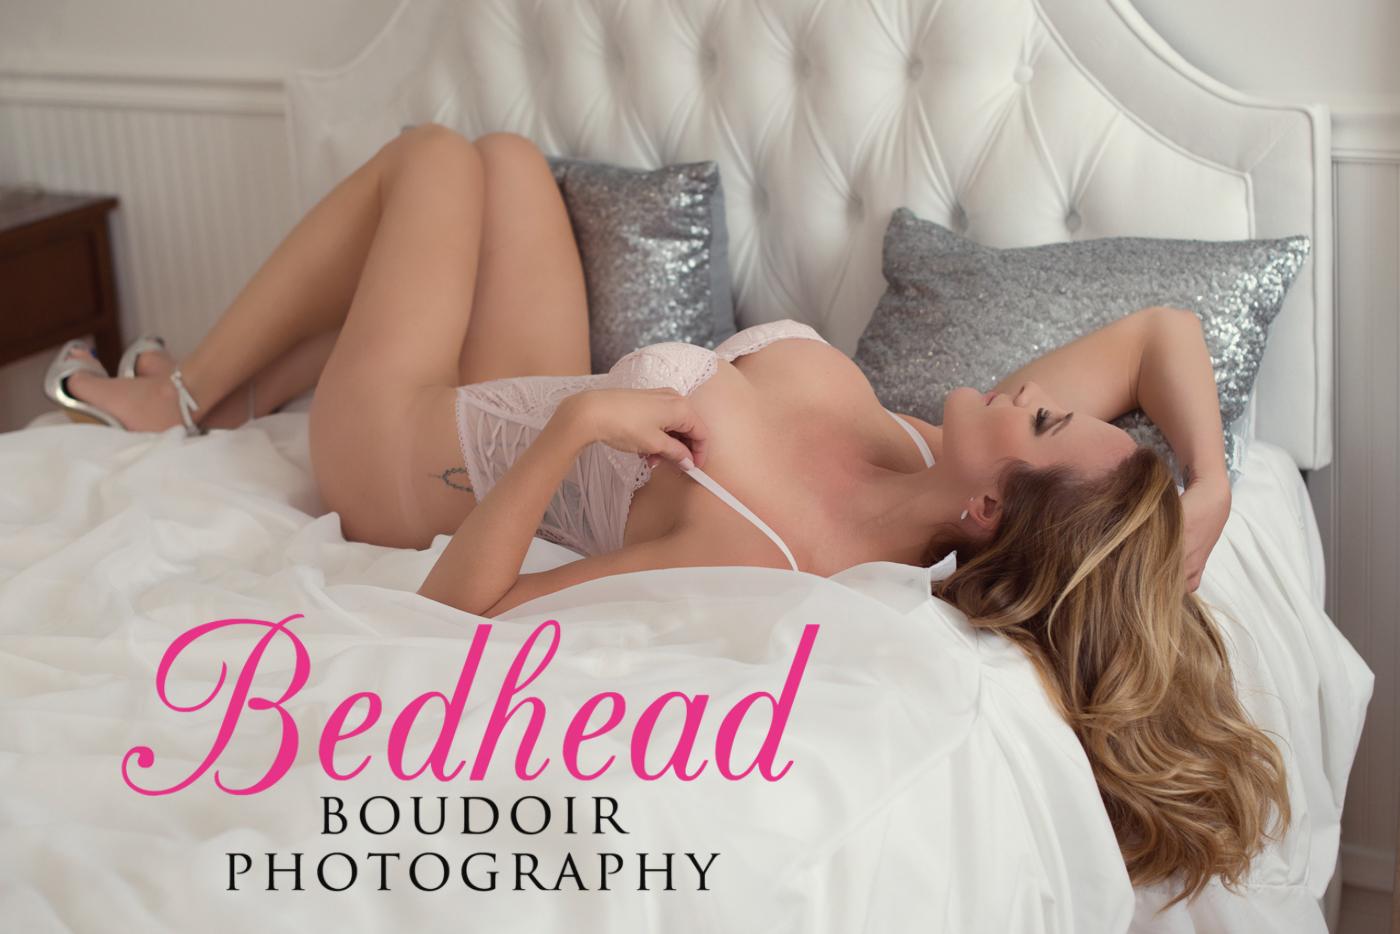 Bedhead_Boudoir_Photography_Chicago-16.jpg